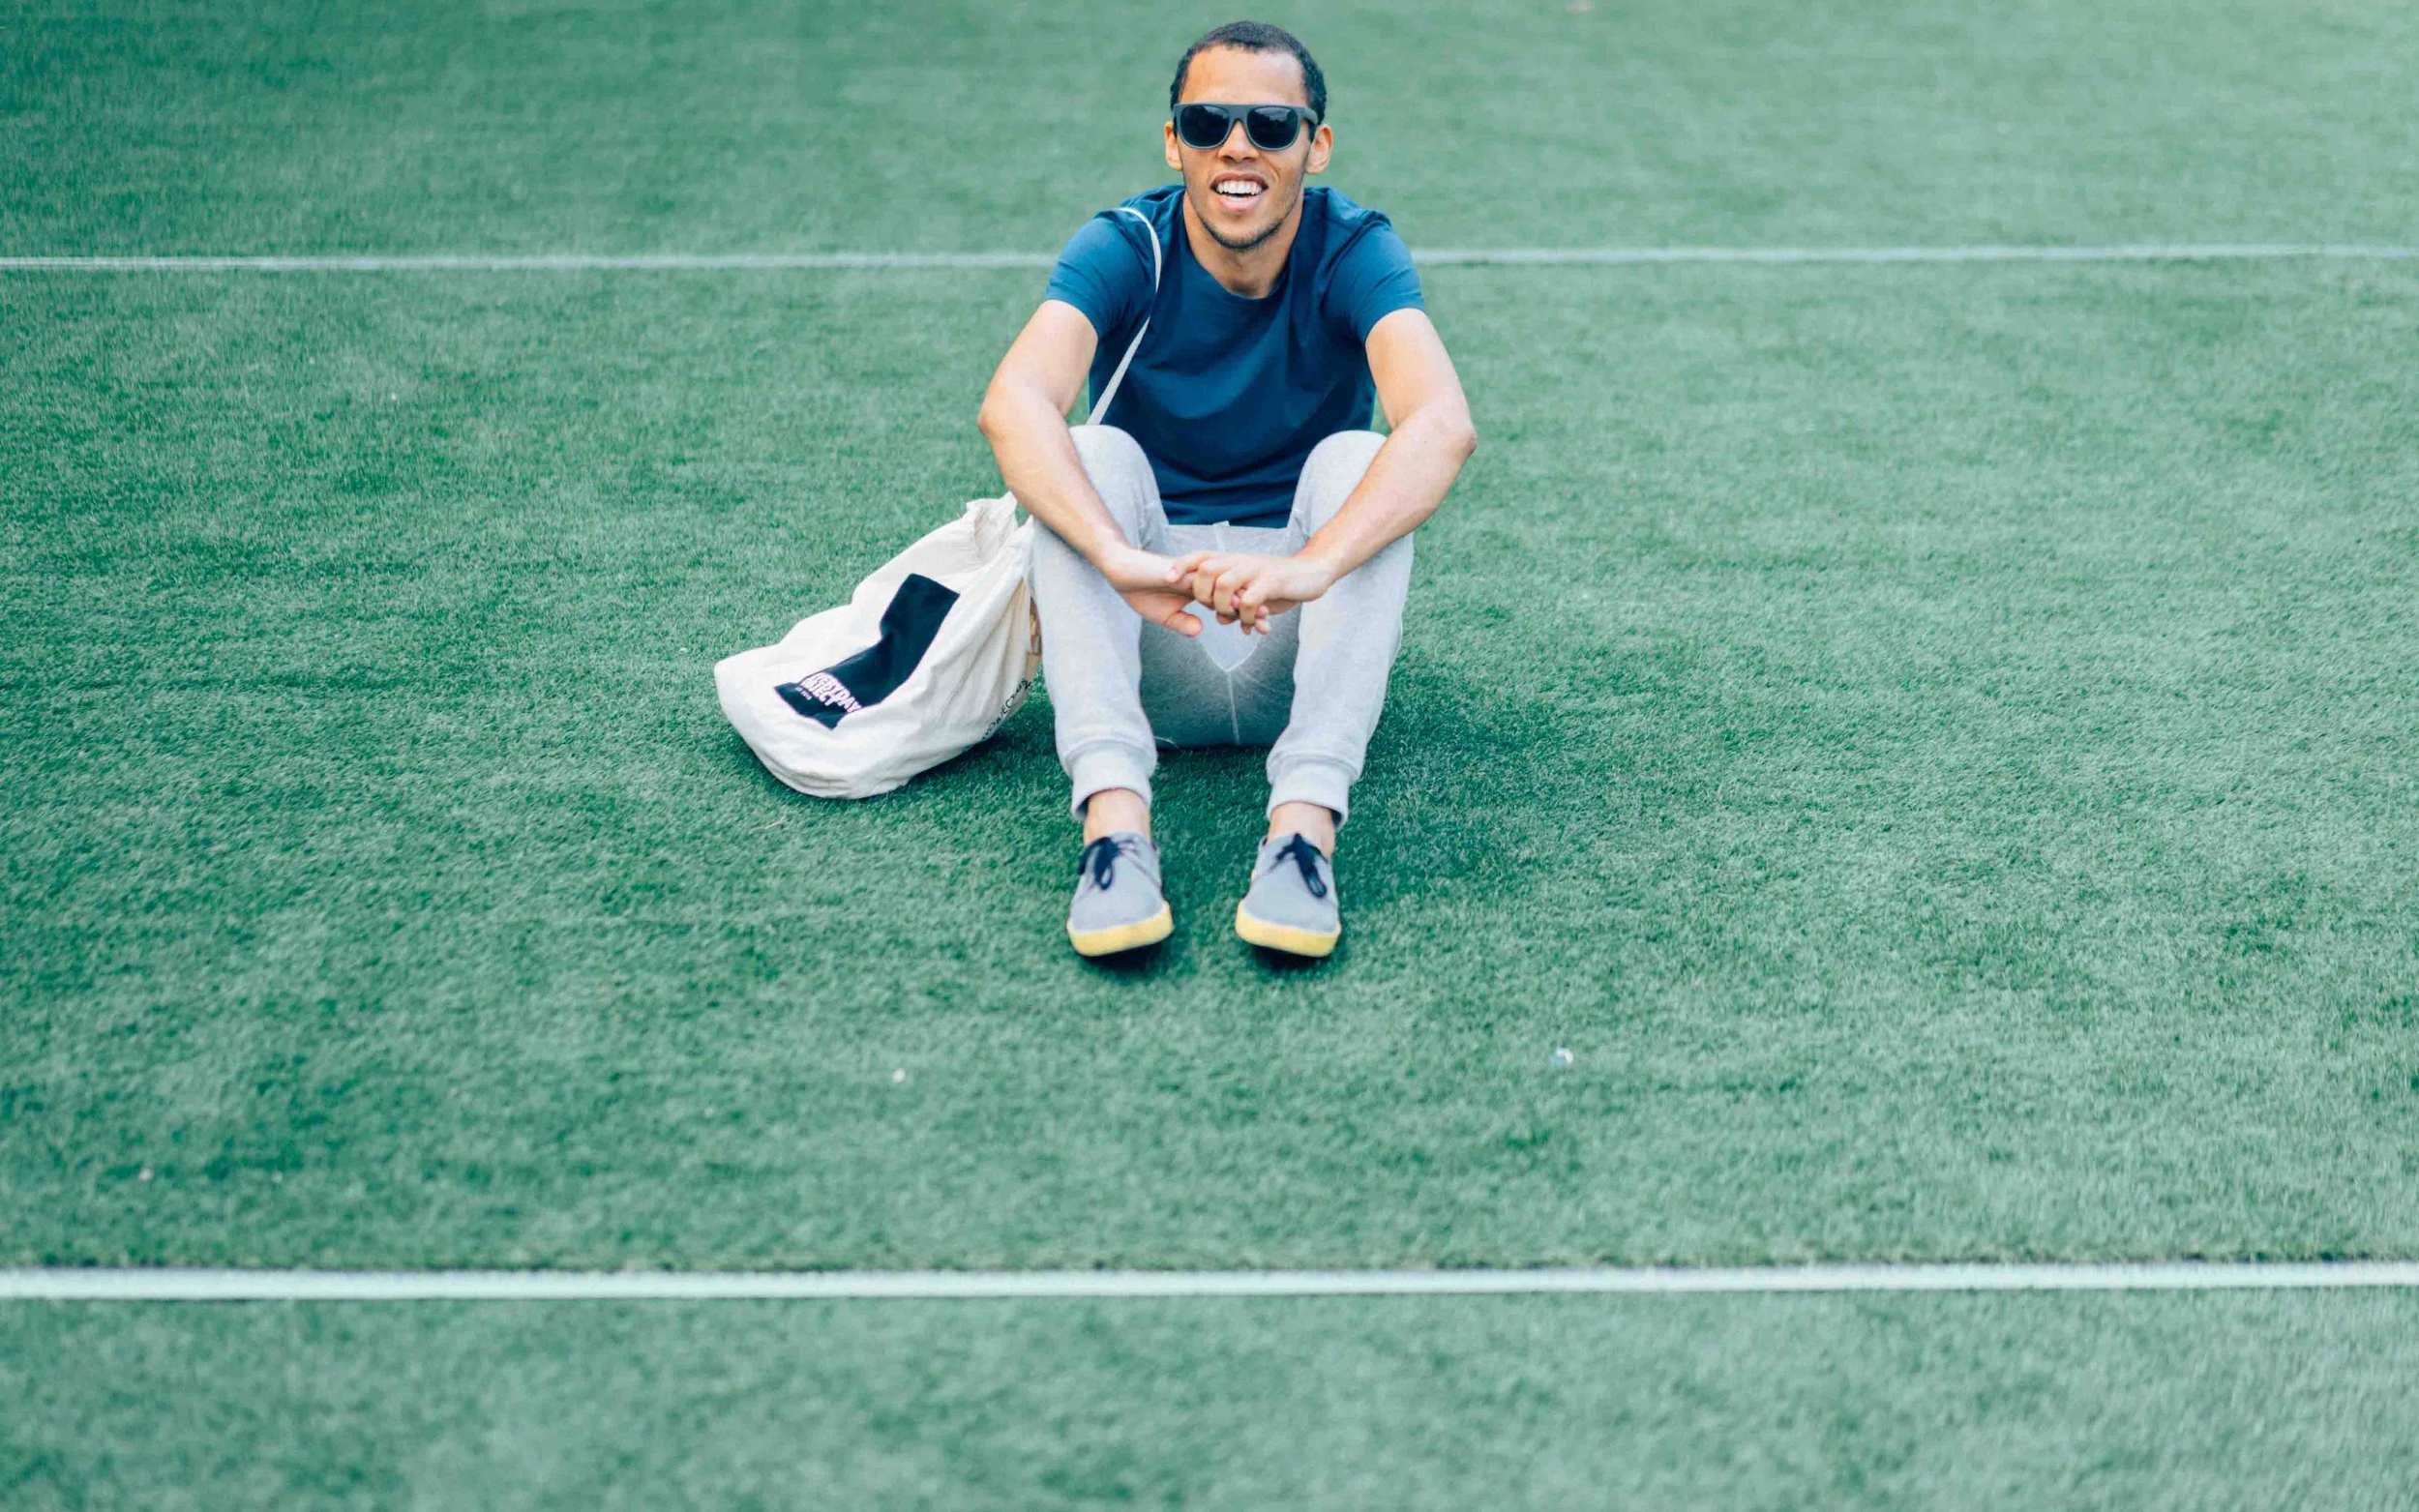 H  &M  Sunglasses  |  Z    ara  T-shirt |    E    veryday Object  Bag |  H    &M  Sweatpants   |    O      li13    Shoes